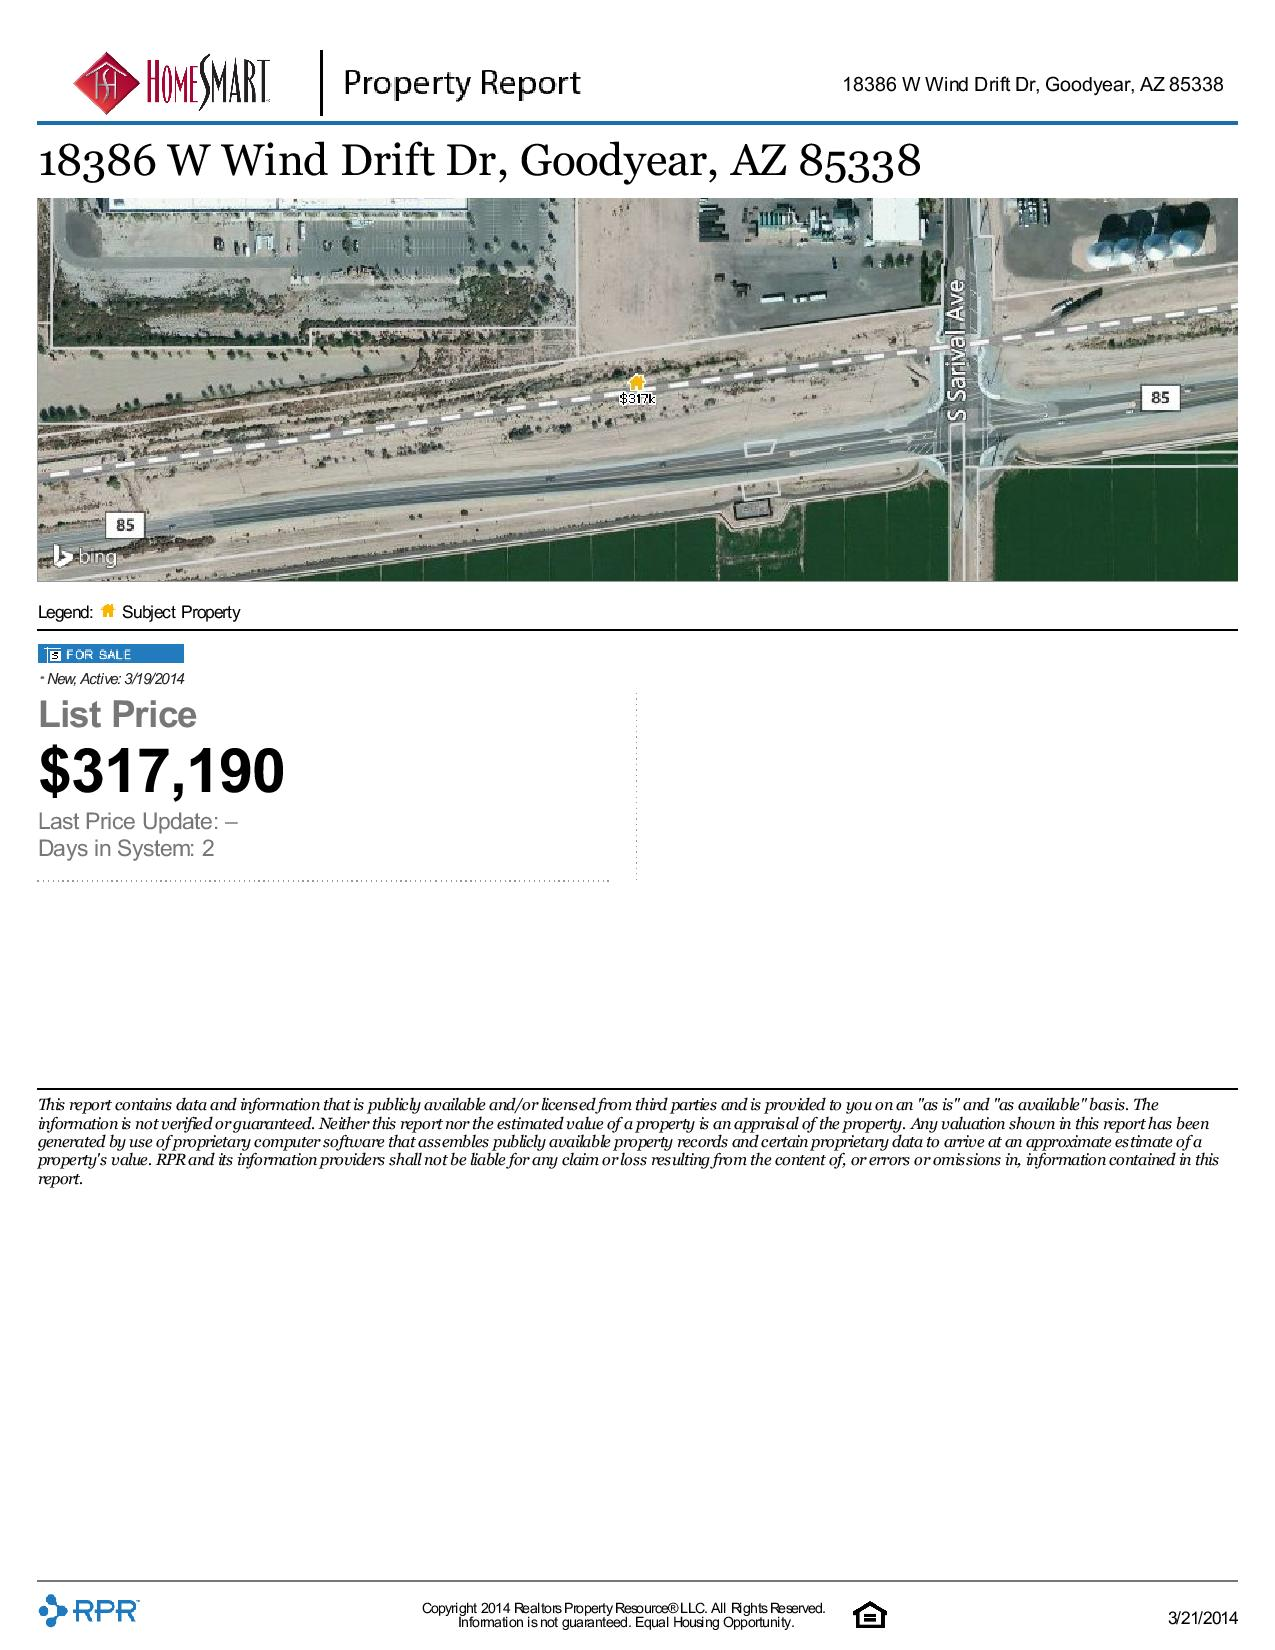 18386-W-Wind-Drift-Dr-Goodyear-AZ-85338-page-002